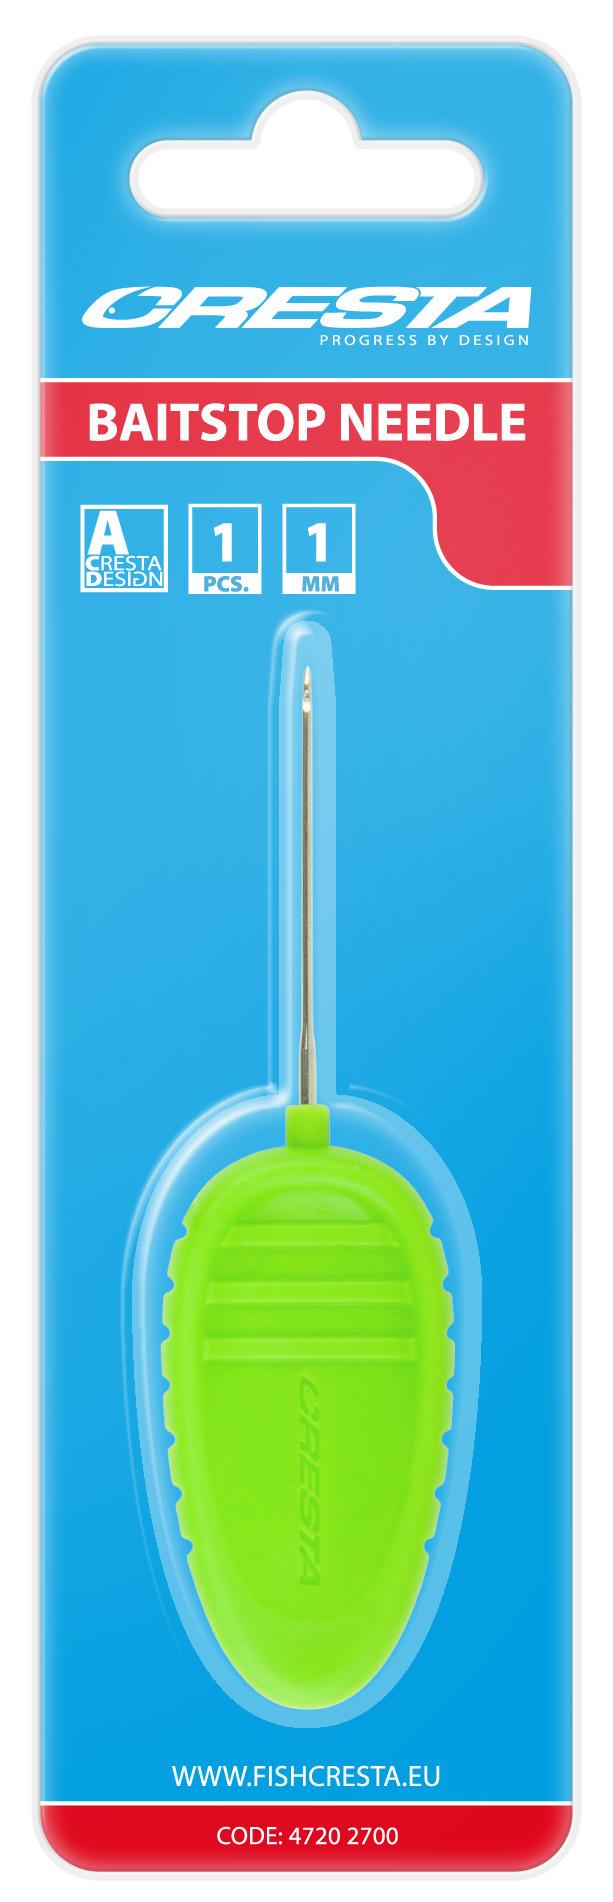 Cresta Baitstop Needle